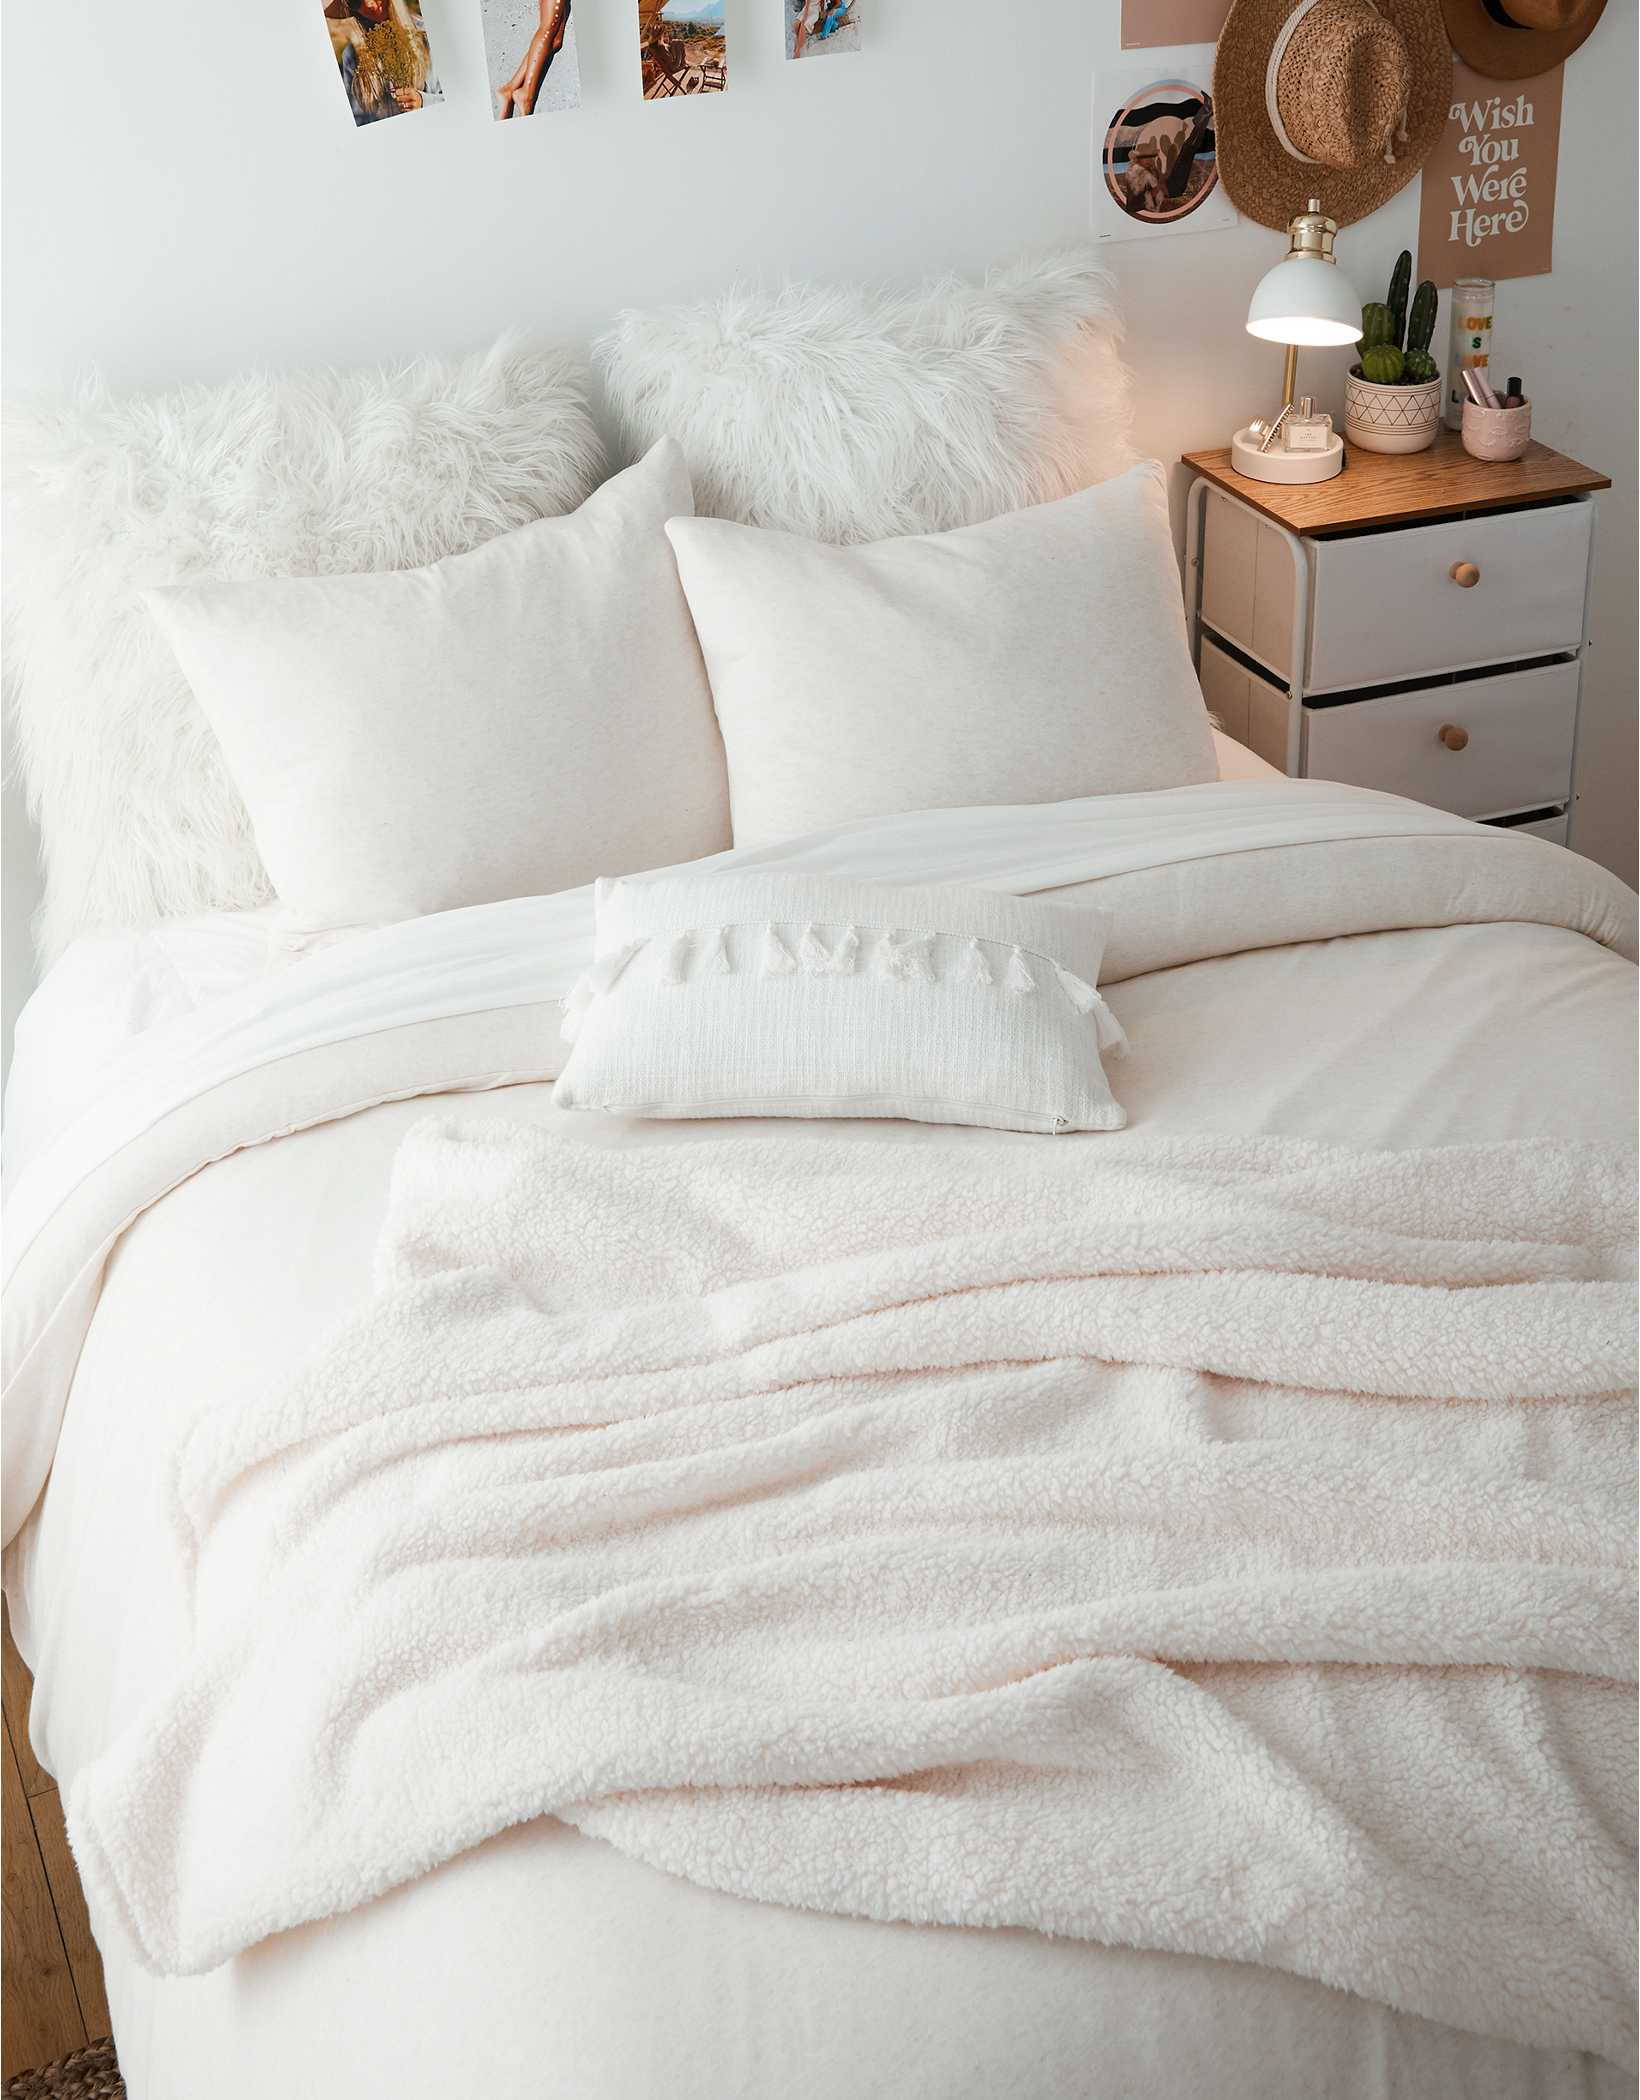 Dormify Fuzzy Fleece Throw Blanket